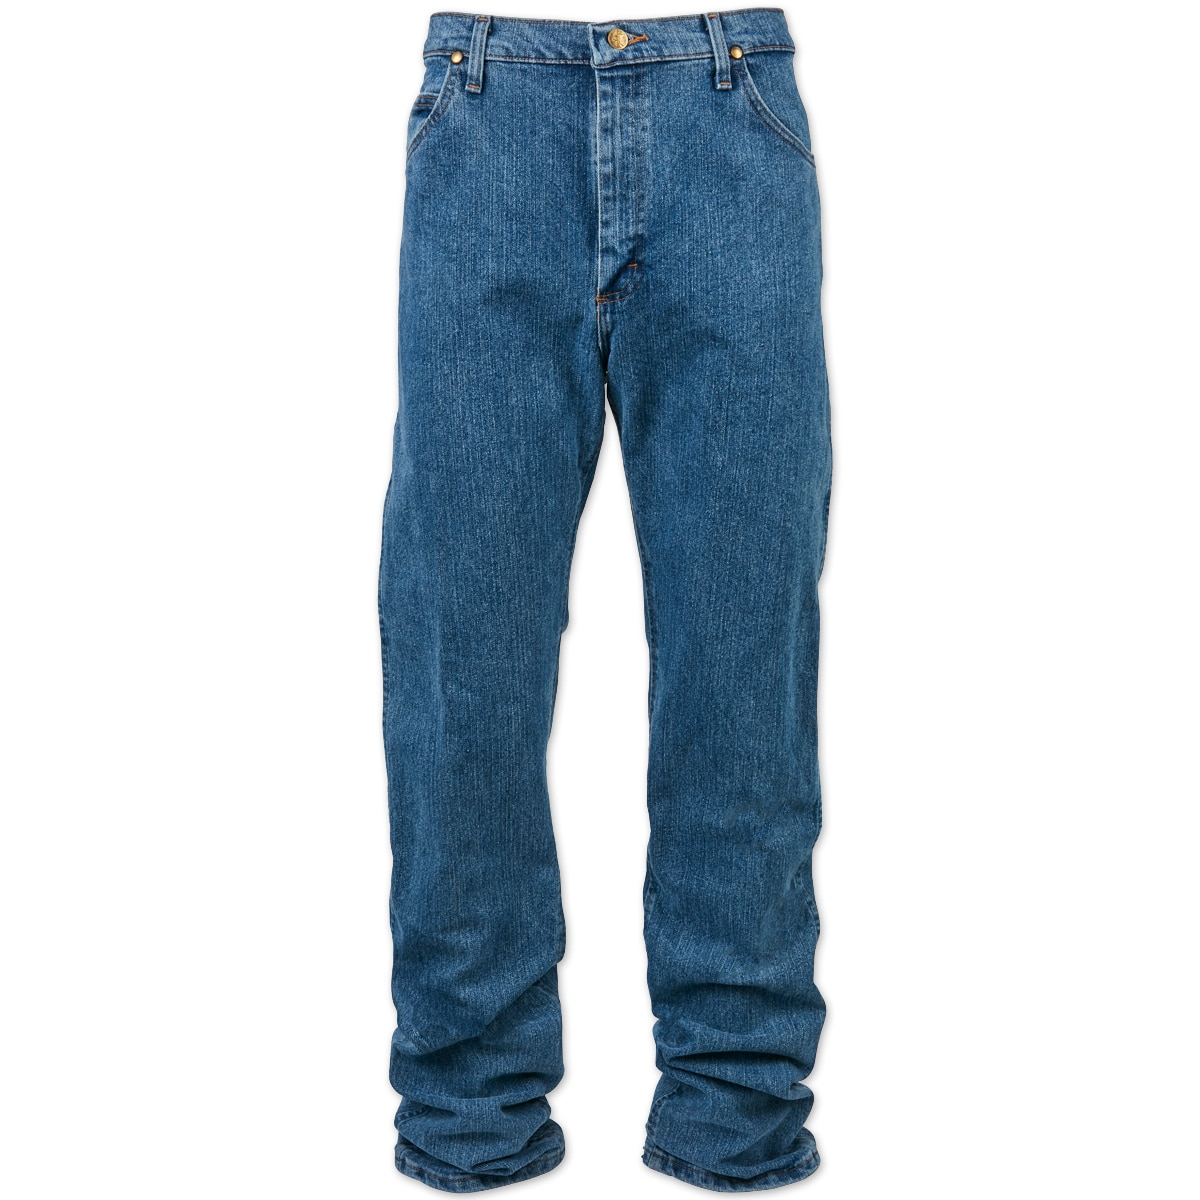 61d69246 Wrangler Men's Premium Performance Advanced Comfort Cowboy ...